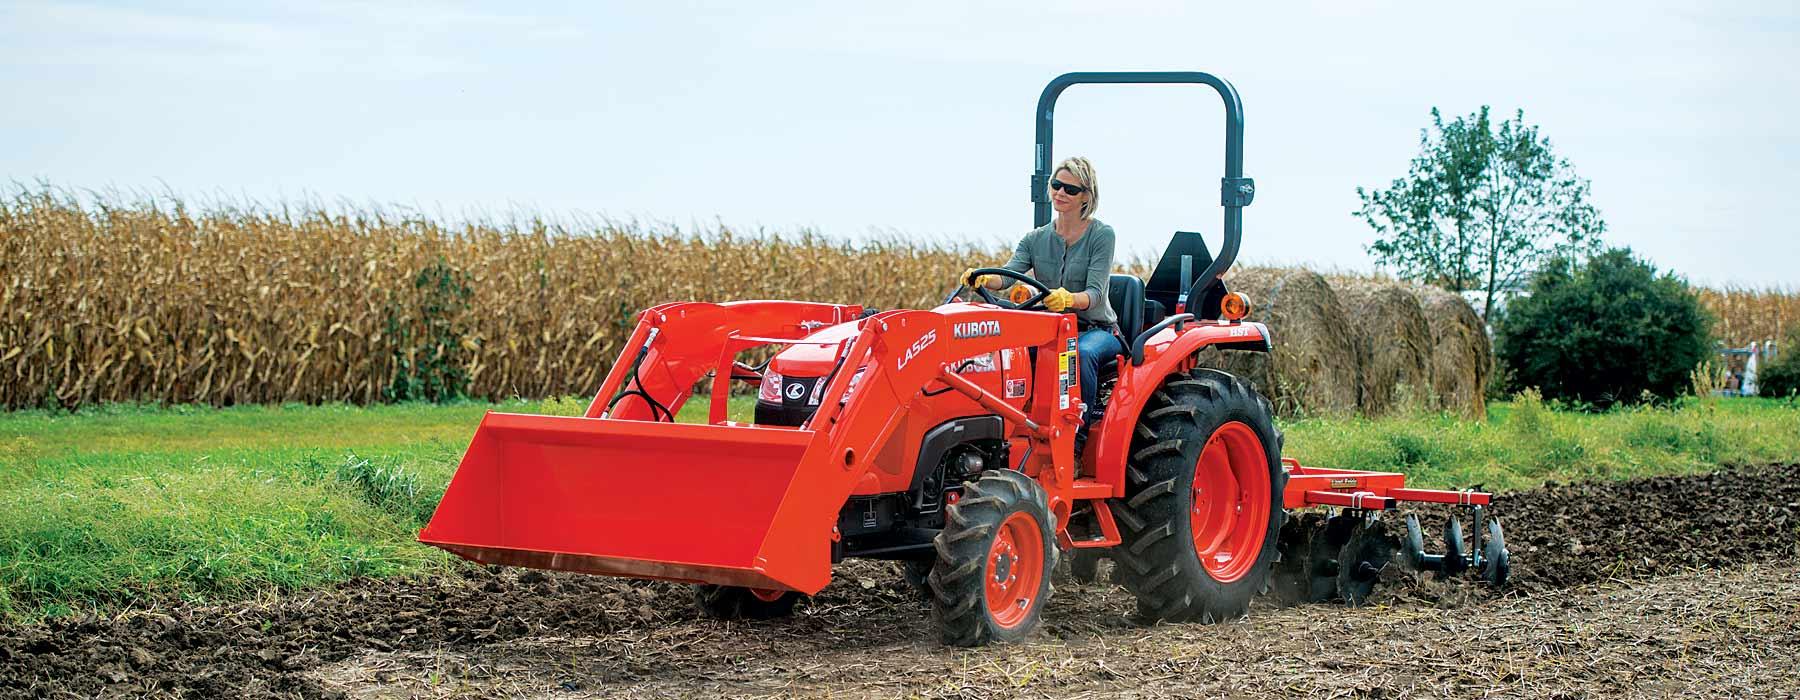 L2501 Kubota Tractor